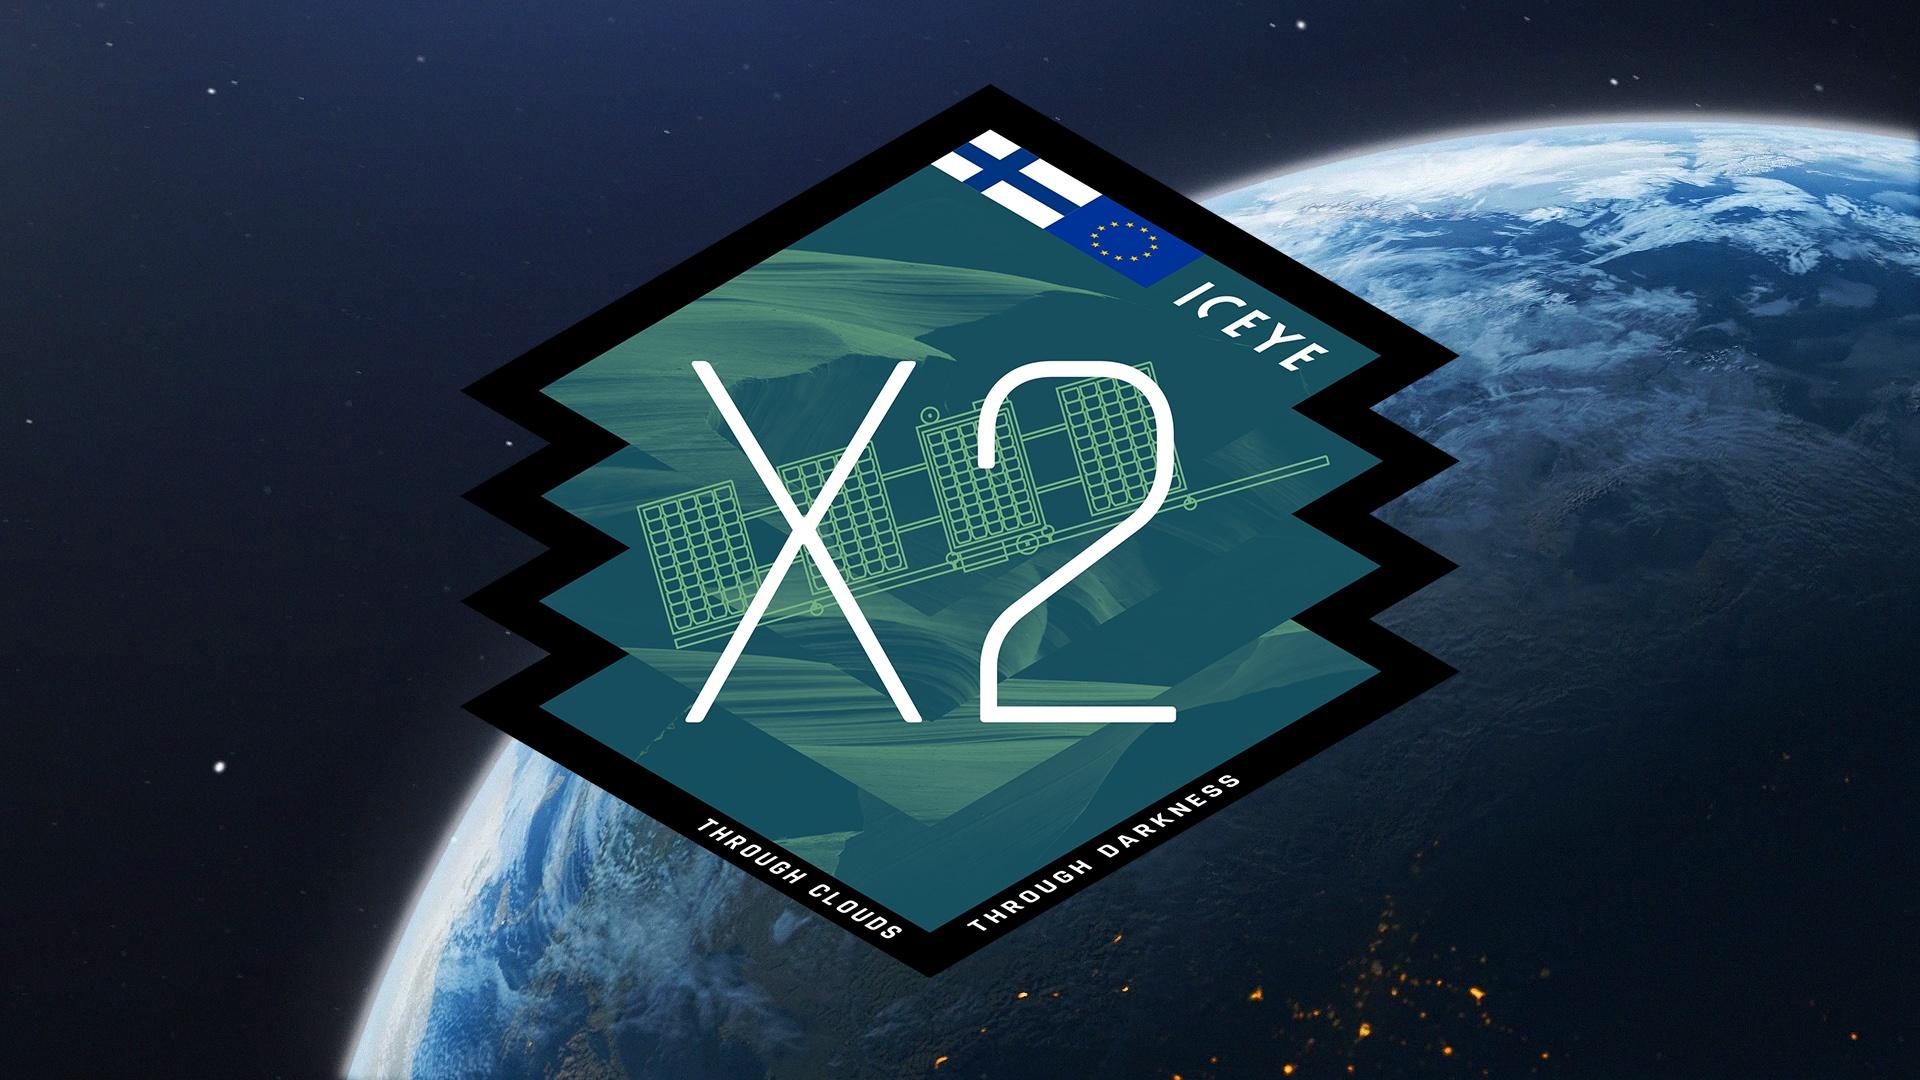 ICEYE-X2 Concept Art 2